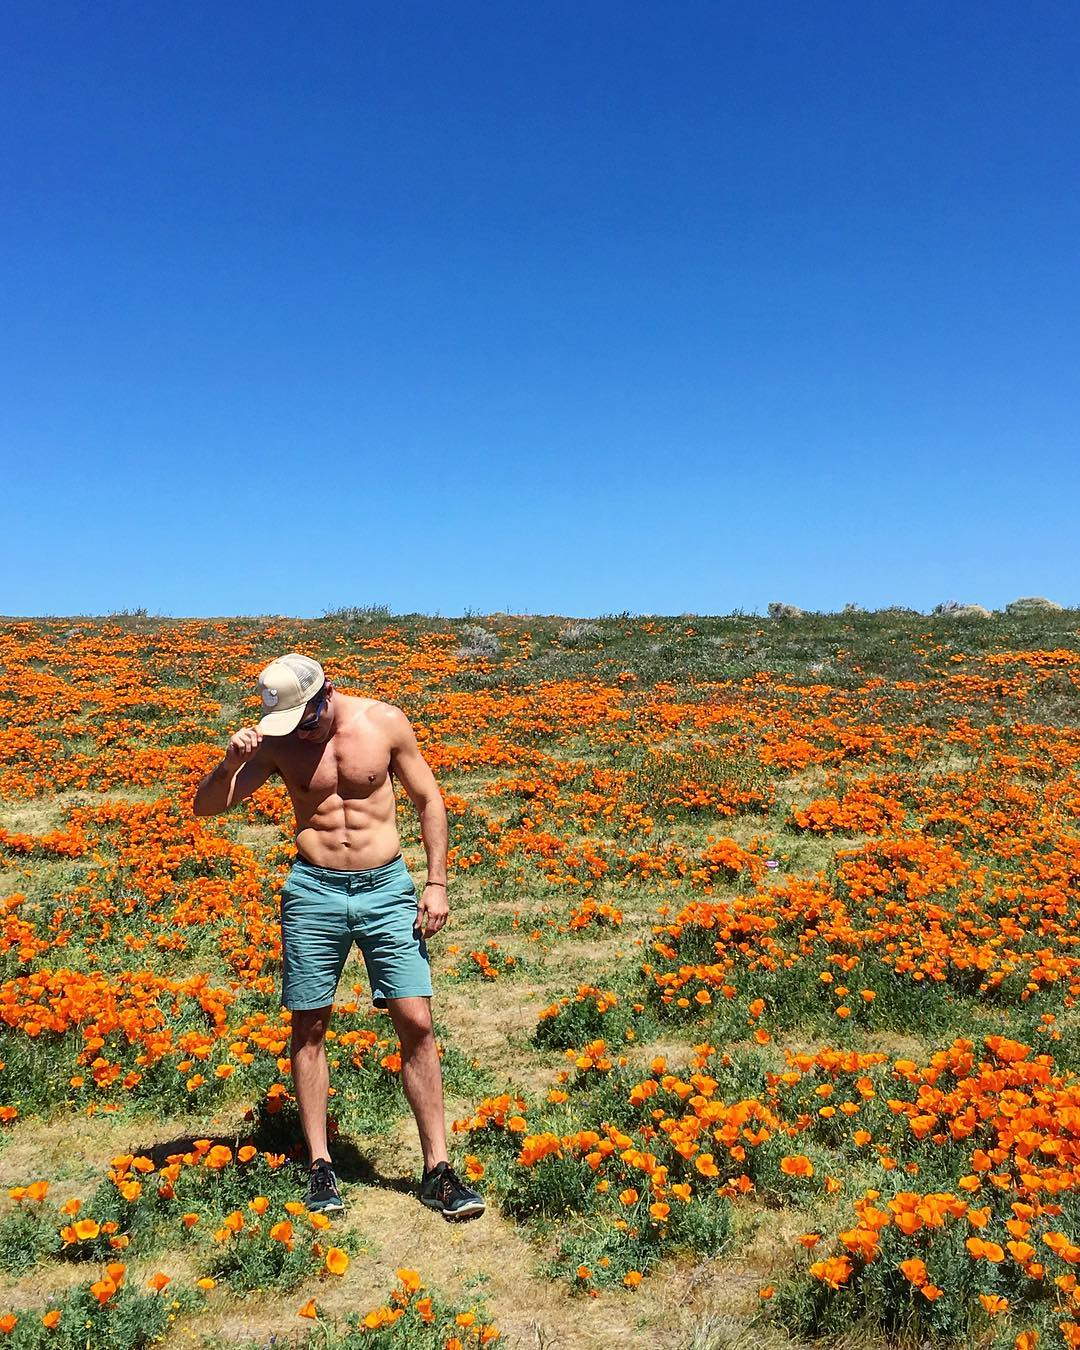 Antelope Valley California Poppy Reserve Super Bloom travel blogger writer Justin Walter atwjustin.com